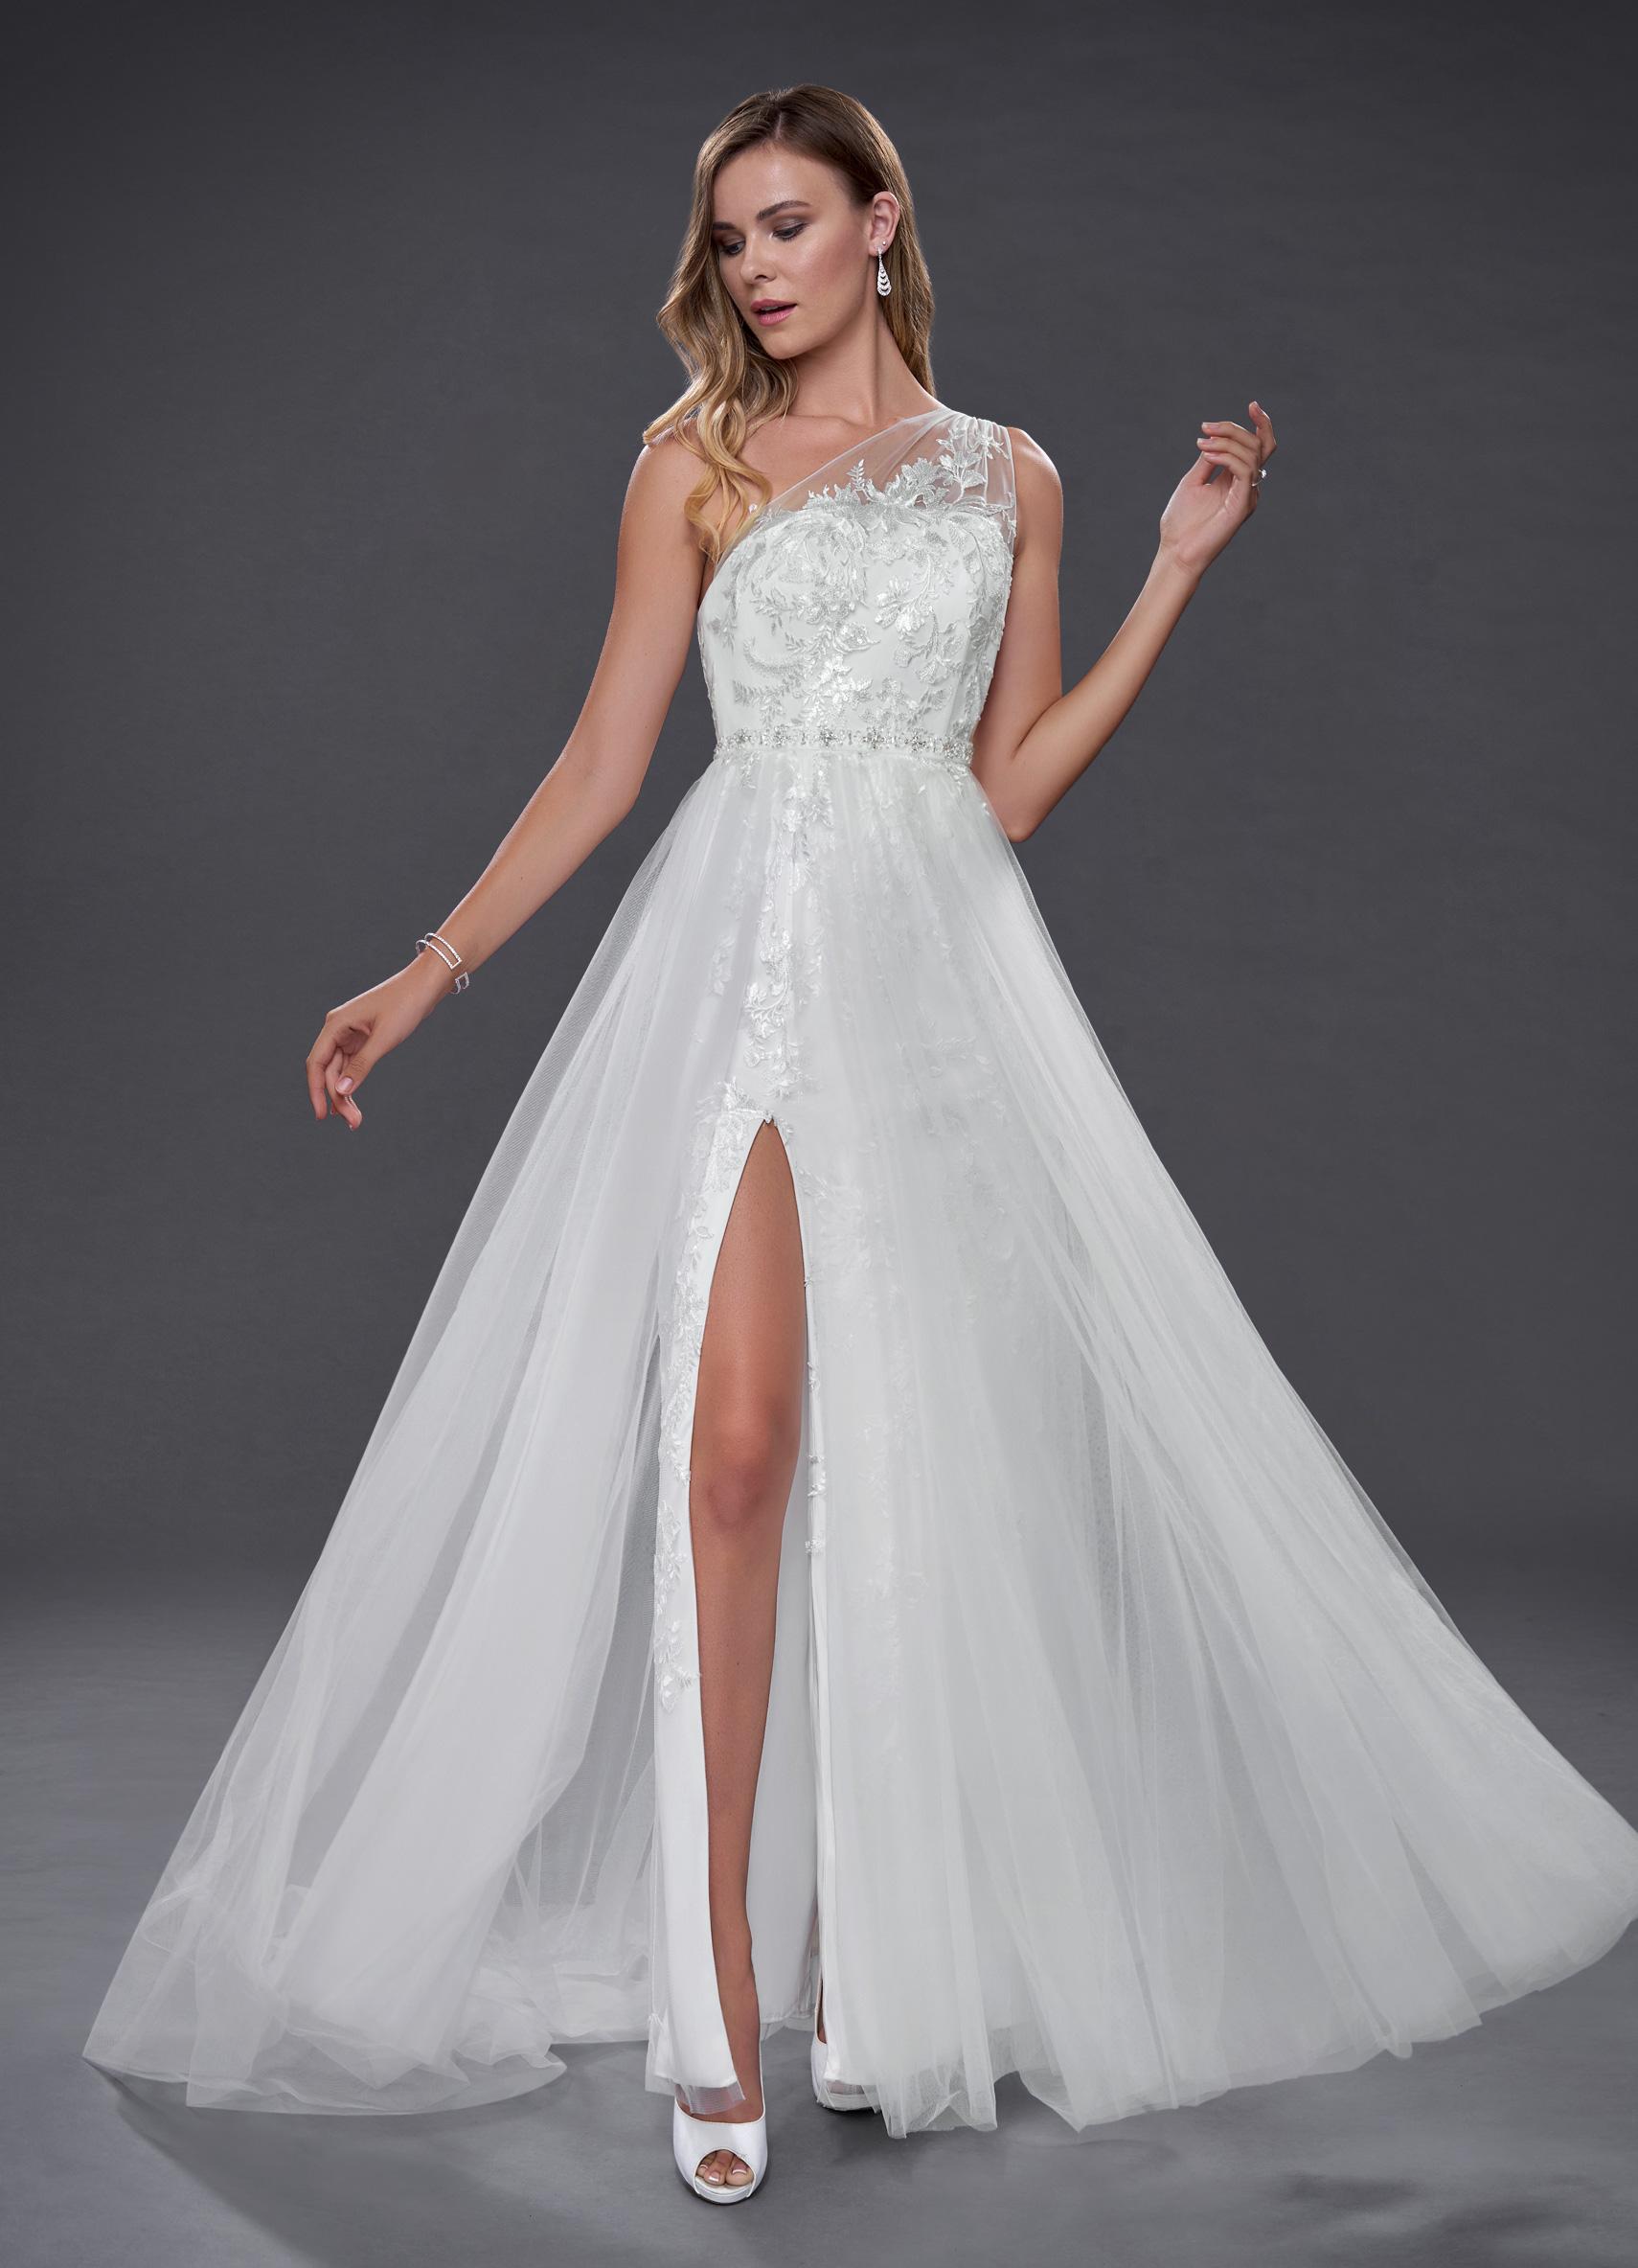 Azazie Elodie in diamond white